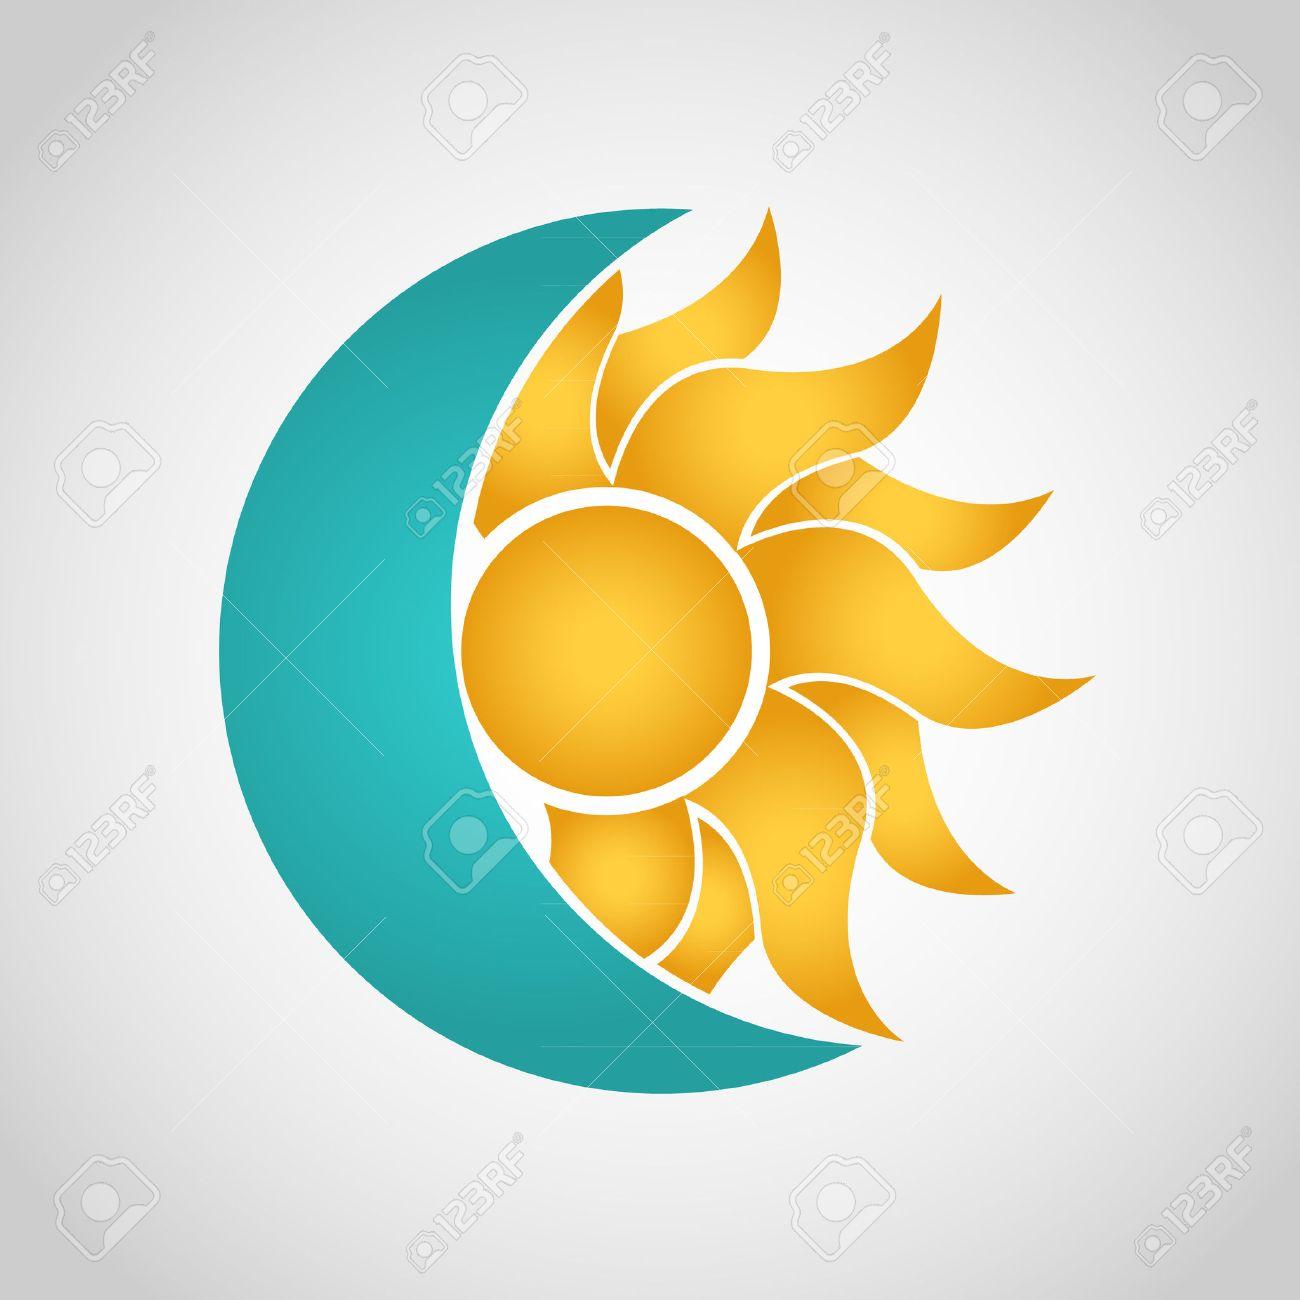 sun and moon logo abstract vector illustration royalty free